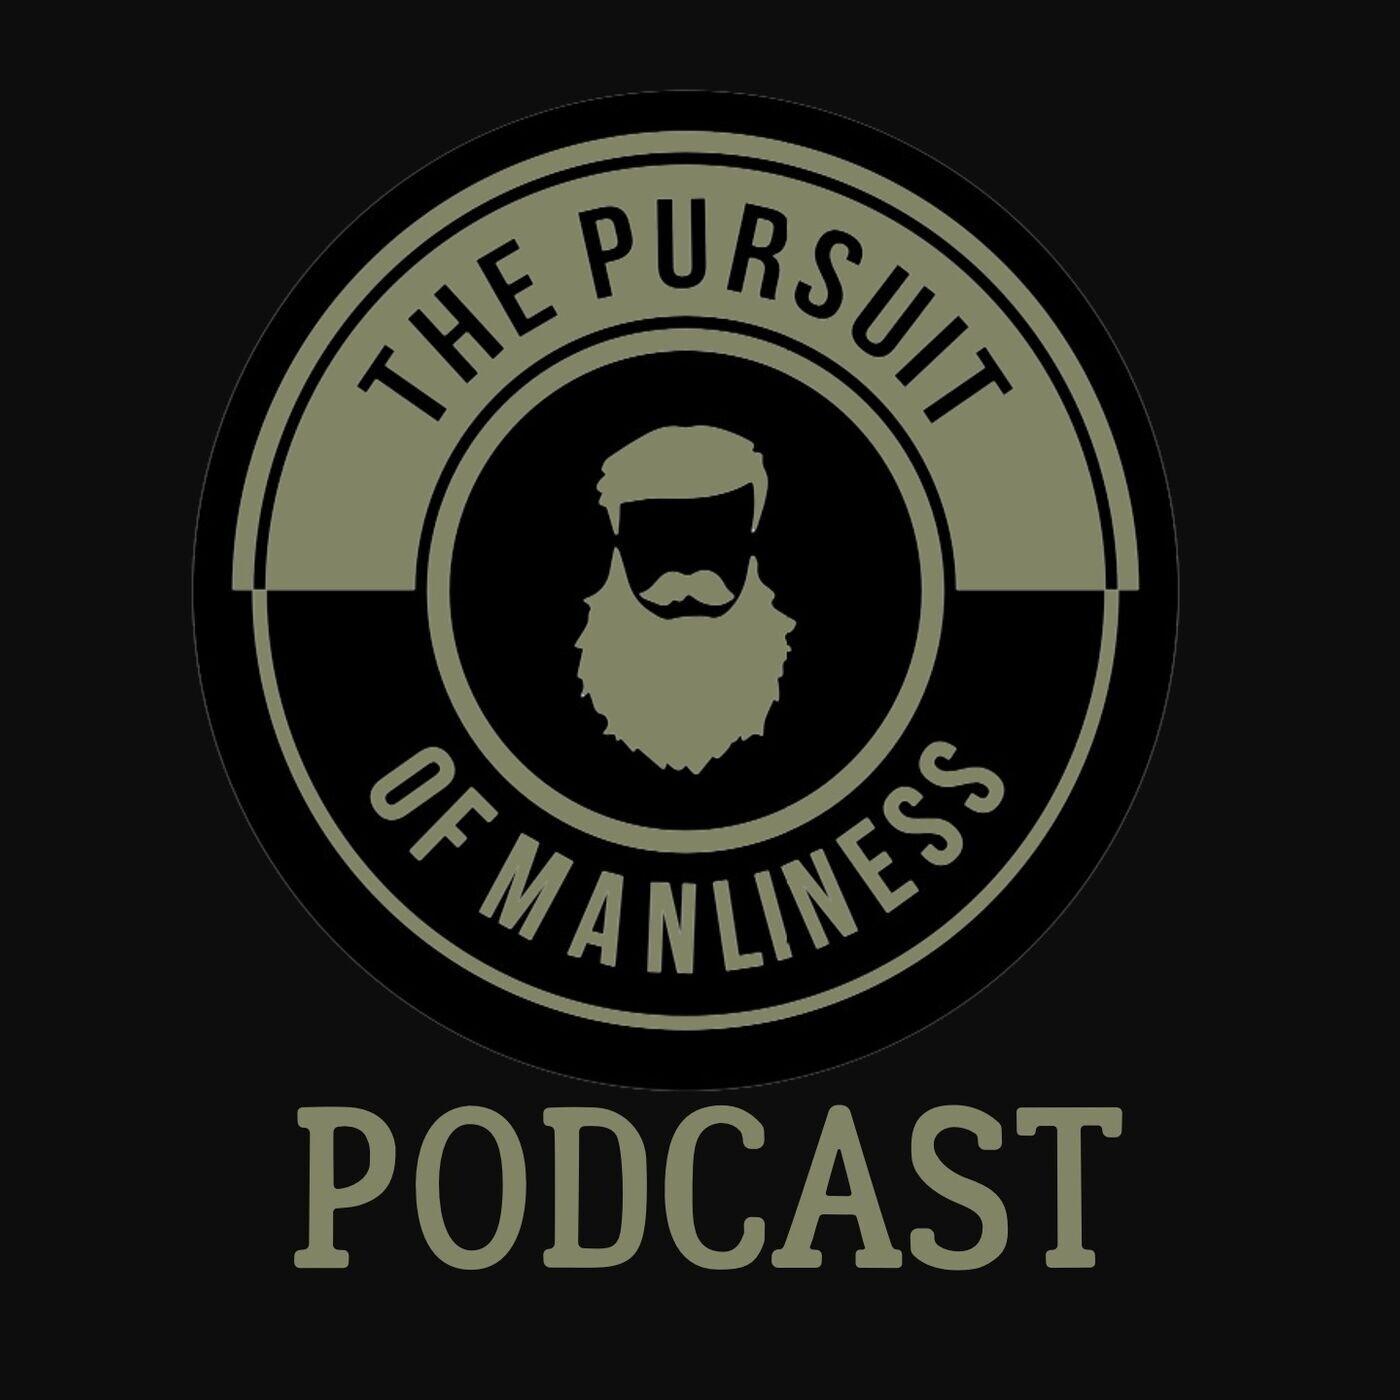 Episode 150: Thane Marcus | Never Settle